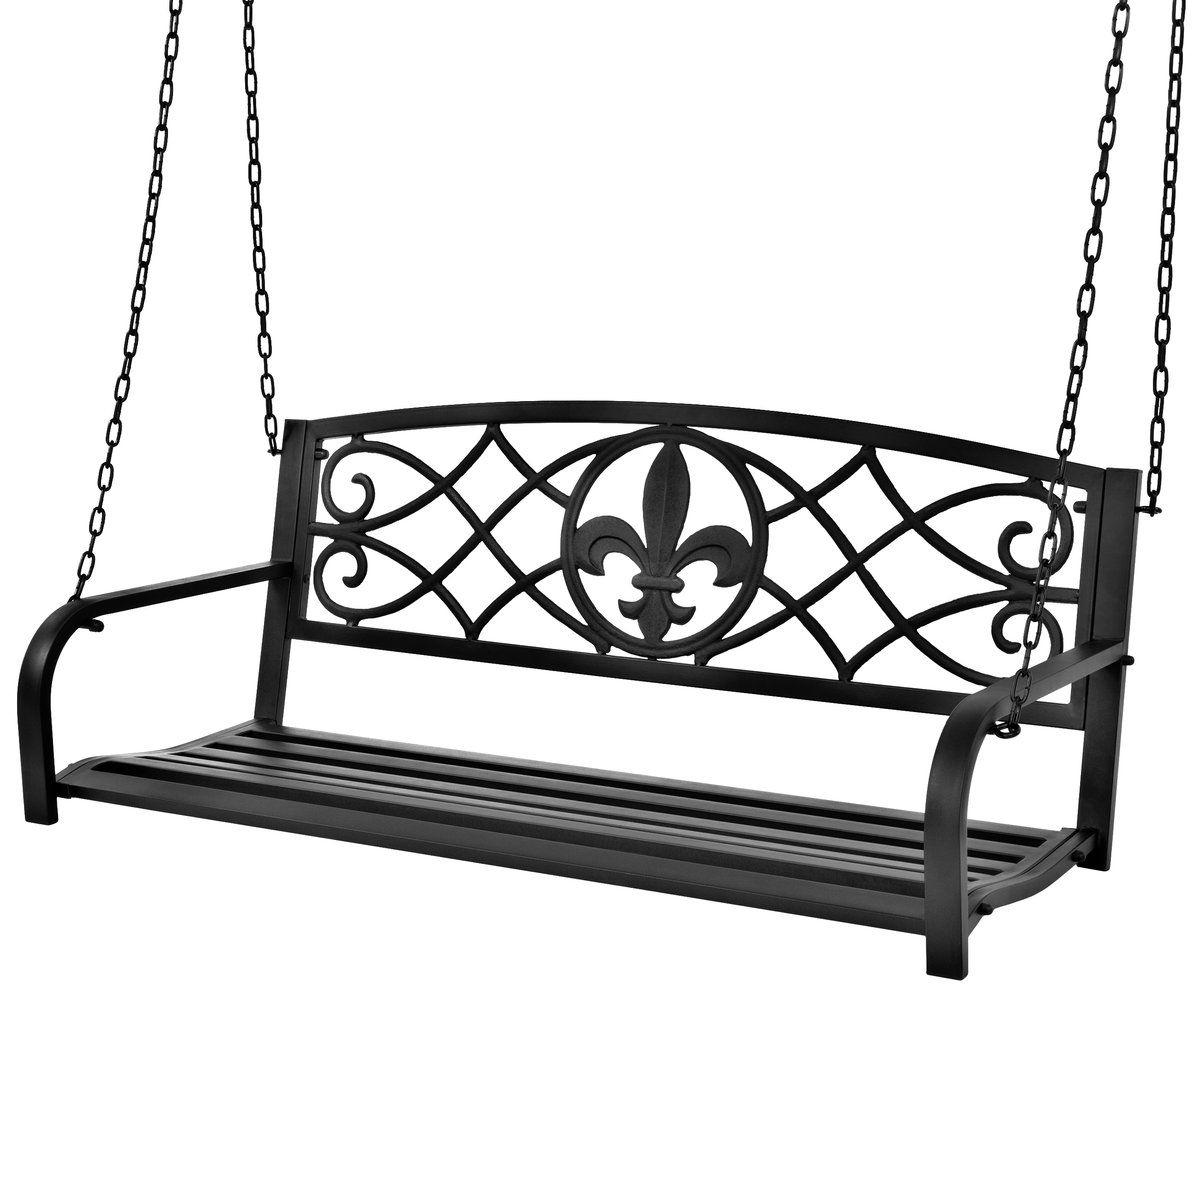 Outdoor Metal Hanging 2 Person Swing Bench W/ Fleur De Lis Inside Most Popular 2 Person Gray Steel Outdoor Swings (View 7 of 30)